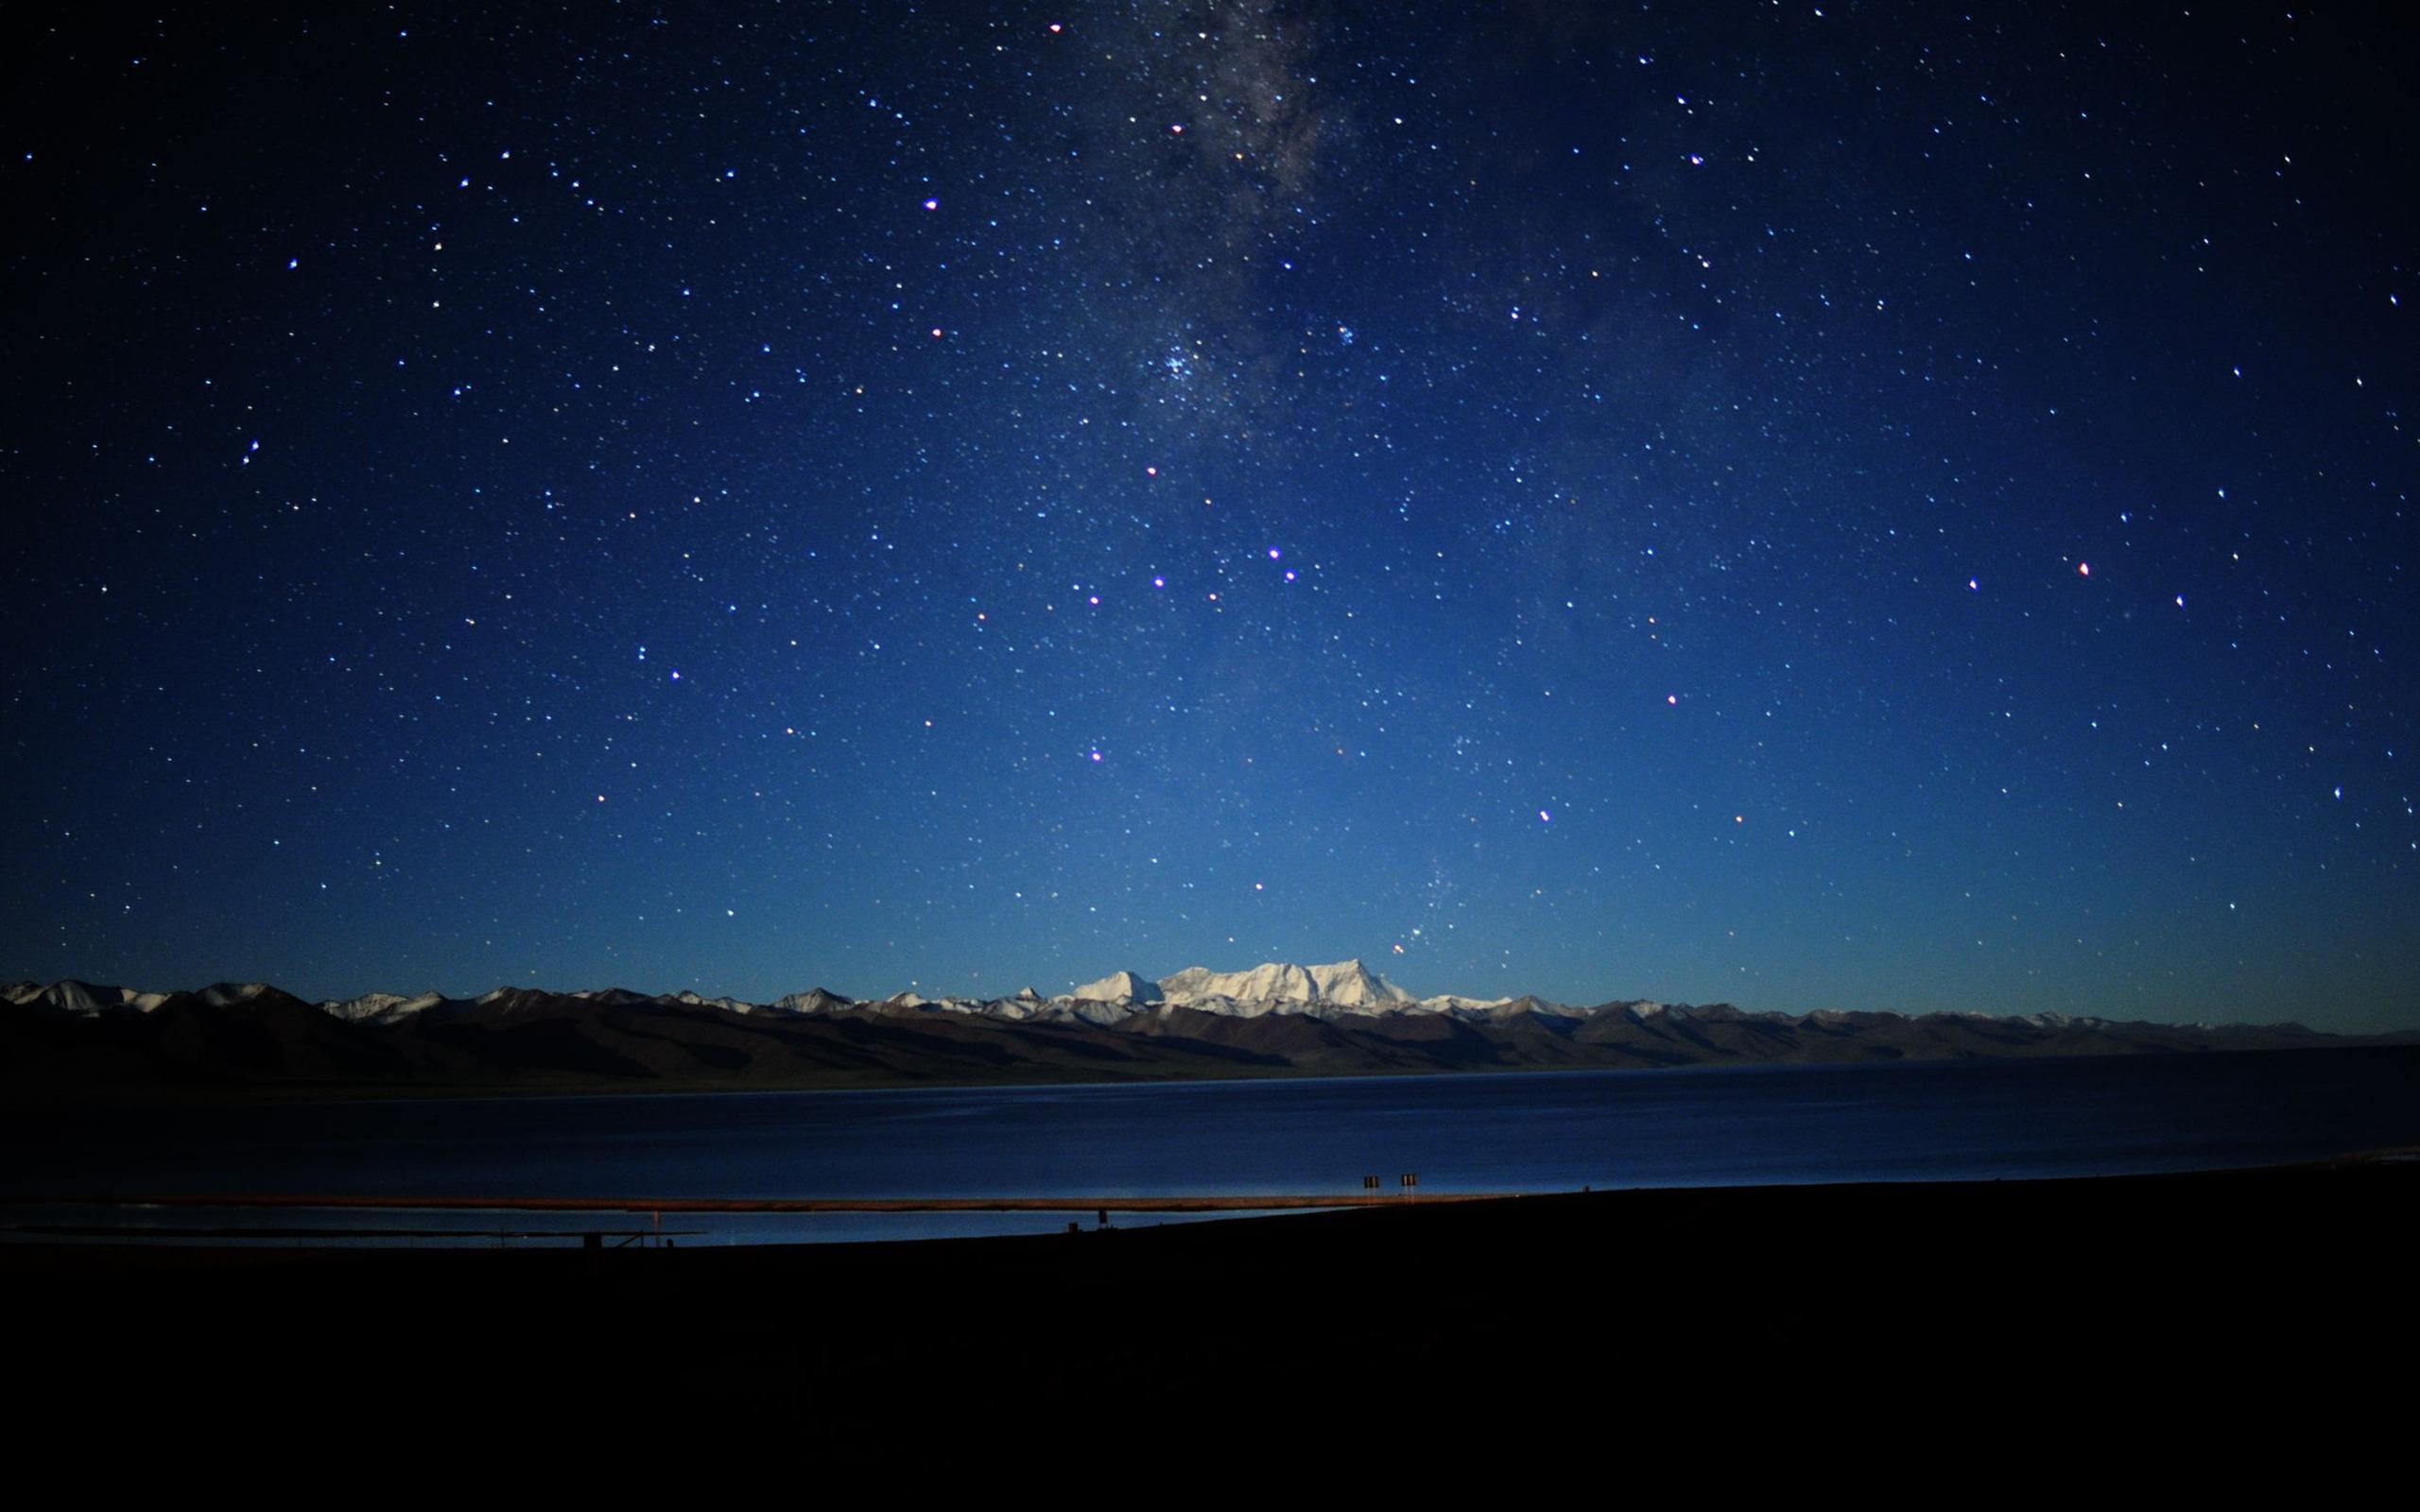 The Night Sky In Tibet Natural Scenery Wallpaper Preview 10wallpaper Com